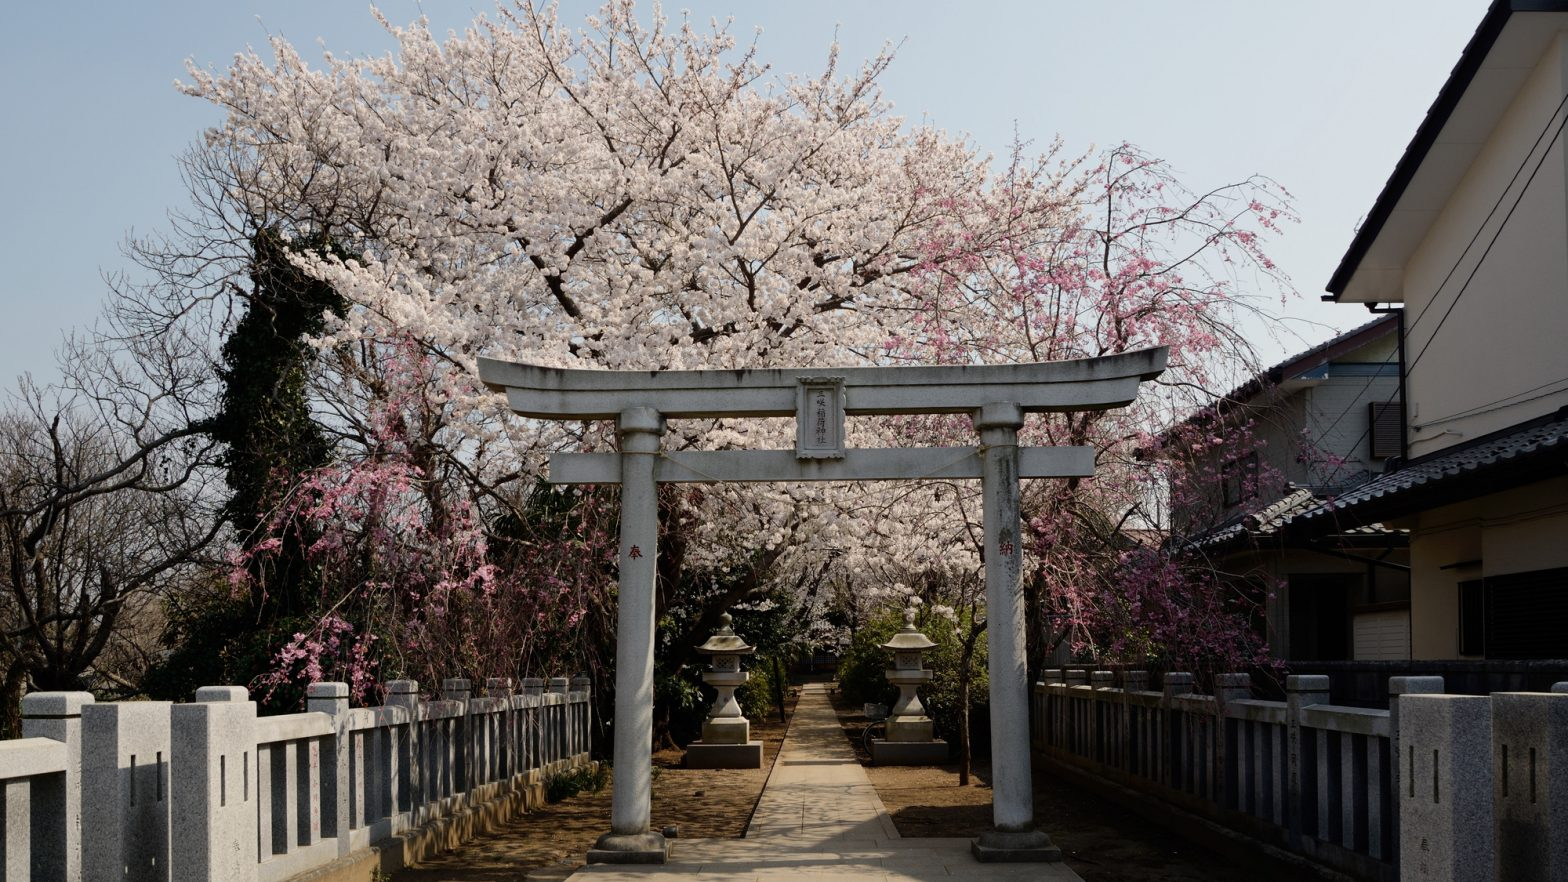 満開の桜の船橋市、三咲稲荷神社